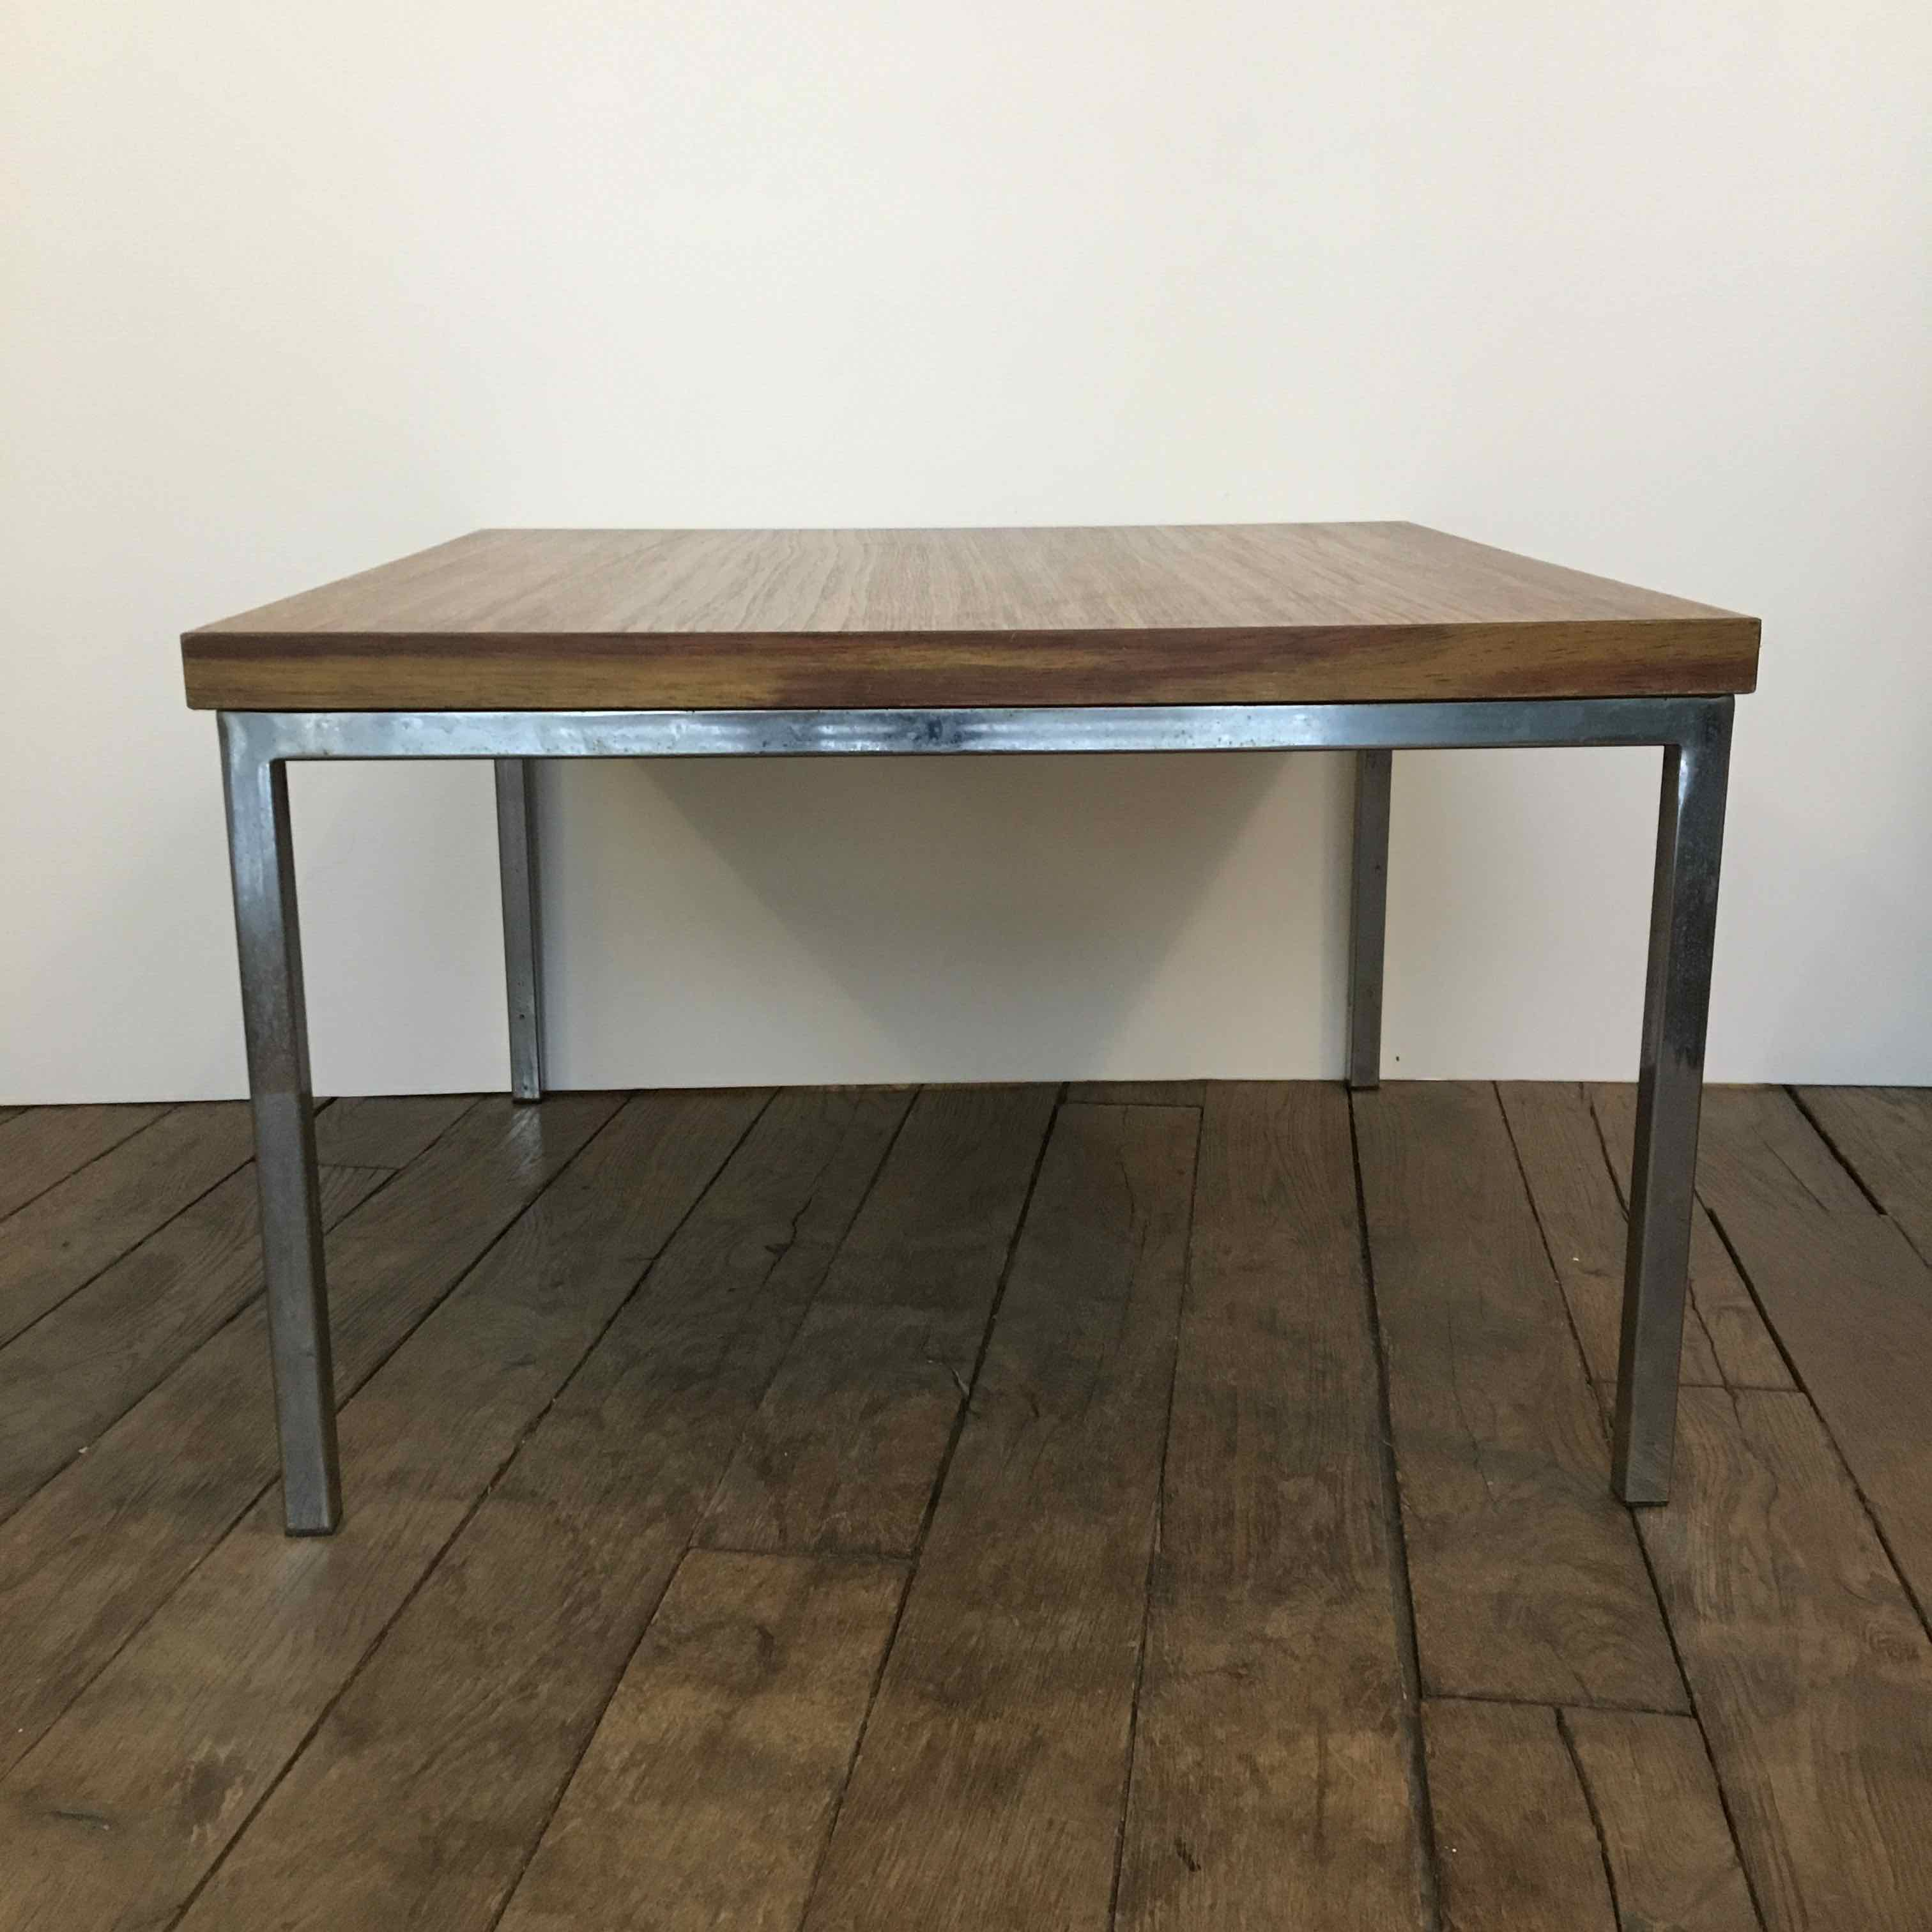 Table Basse En Formica table basse knoll - l'art & la façon